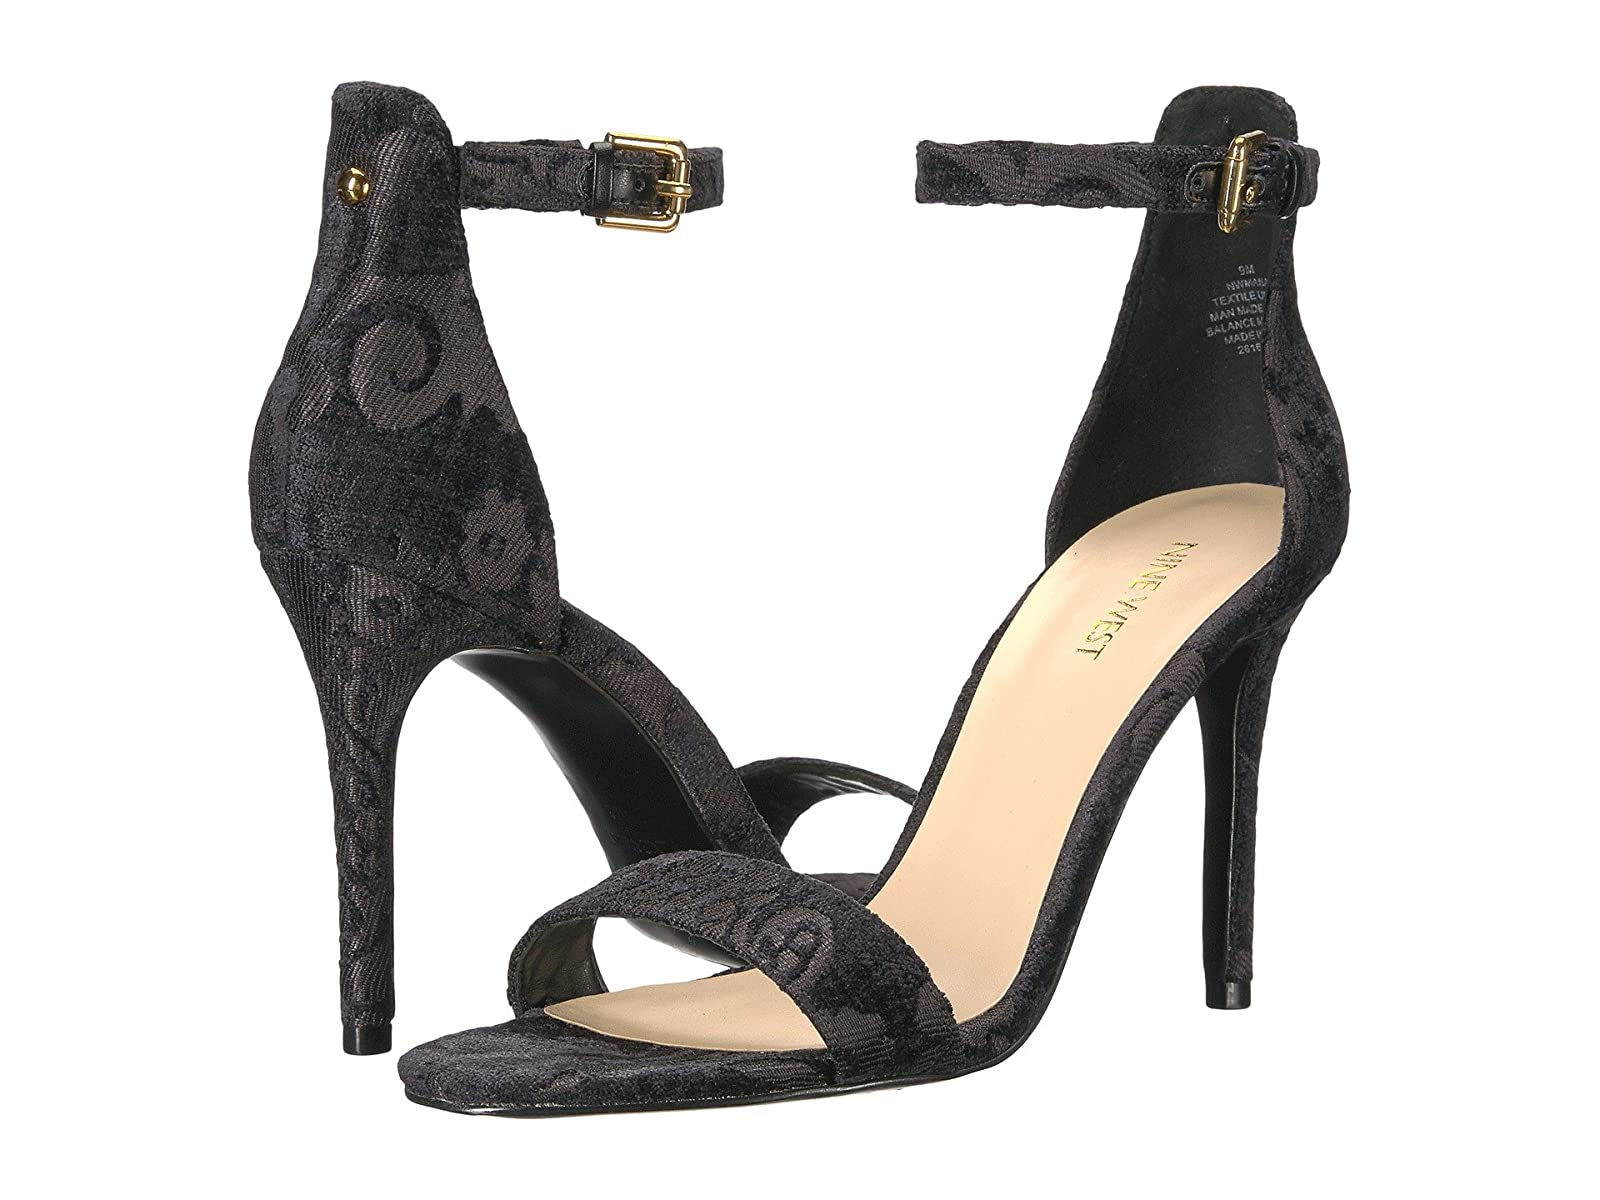 Nine West Mana Stiletto Heel SandalCheap and distinctive eye-catching shoes